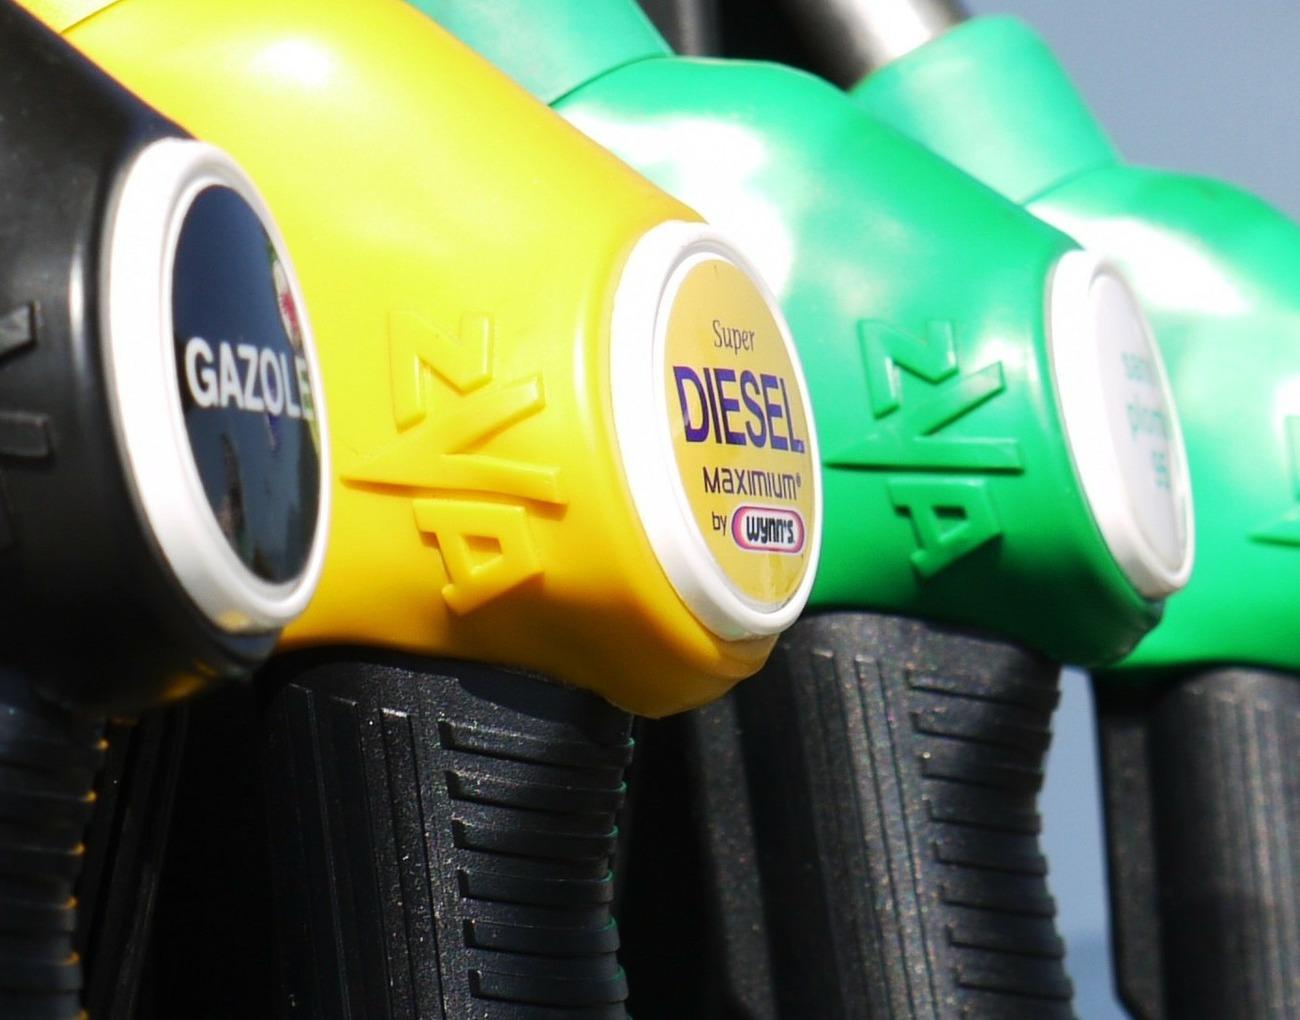 Diesel Fuel on Betondis com